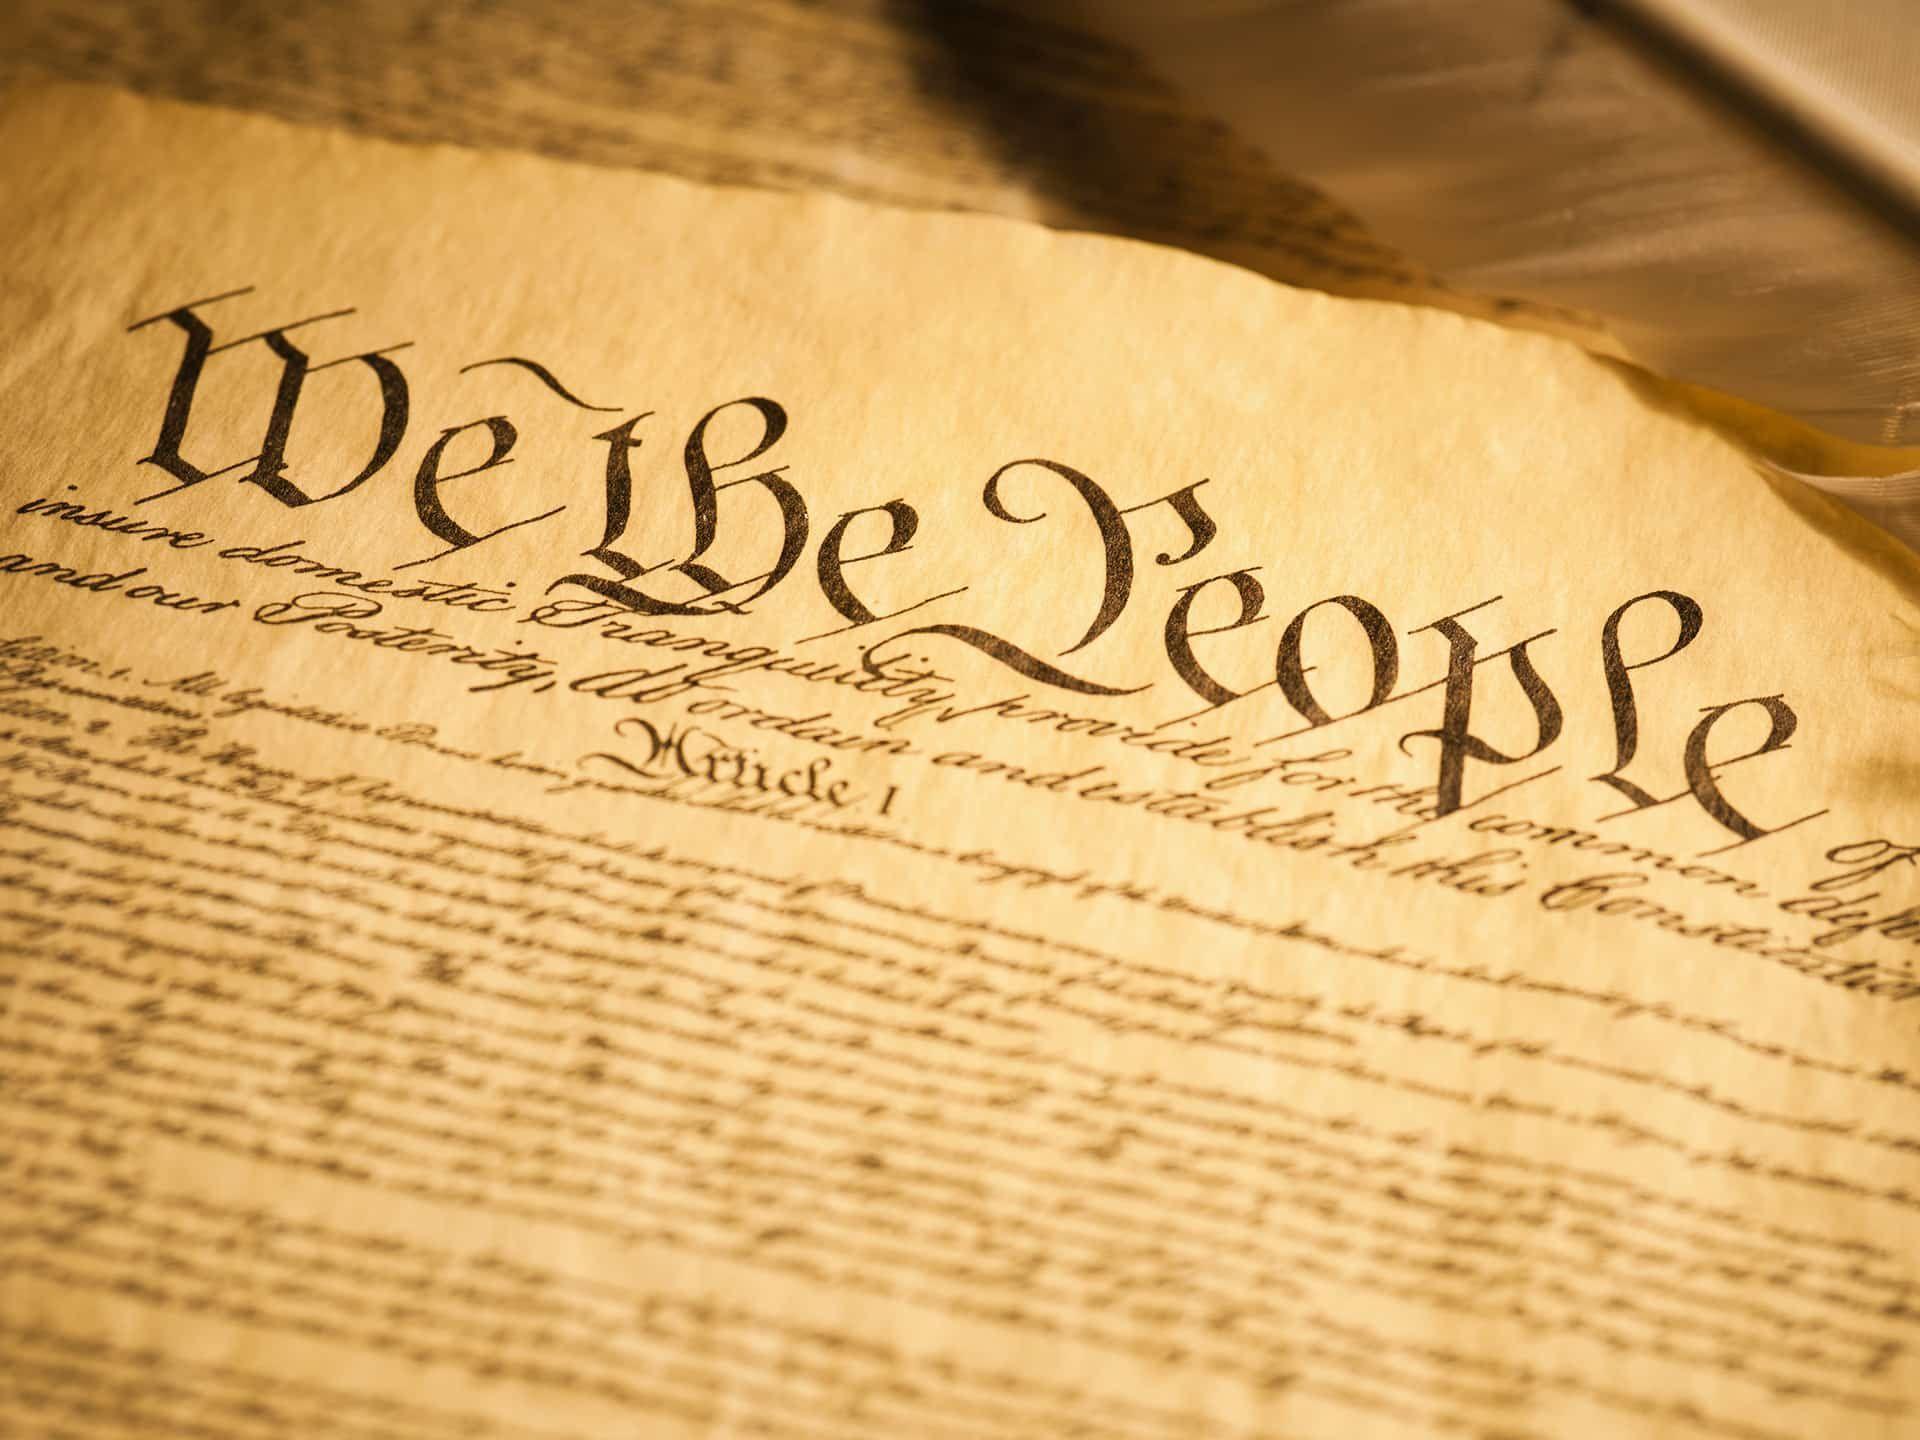 America The Beautiful Constitution, Constitution day